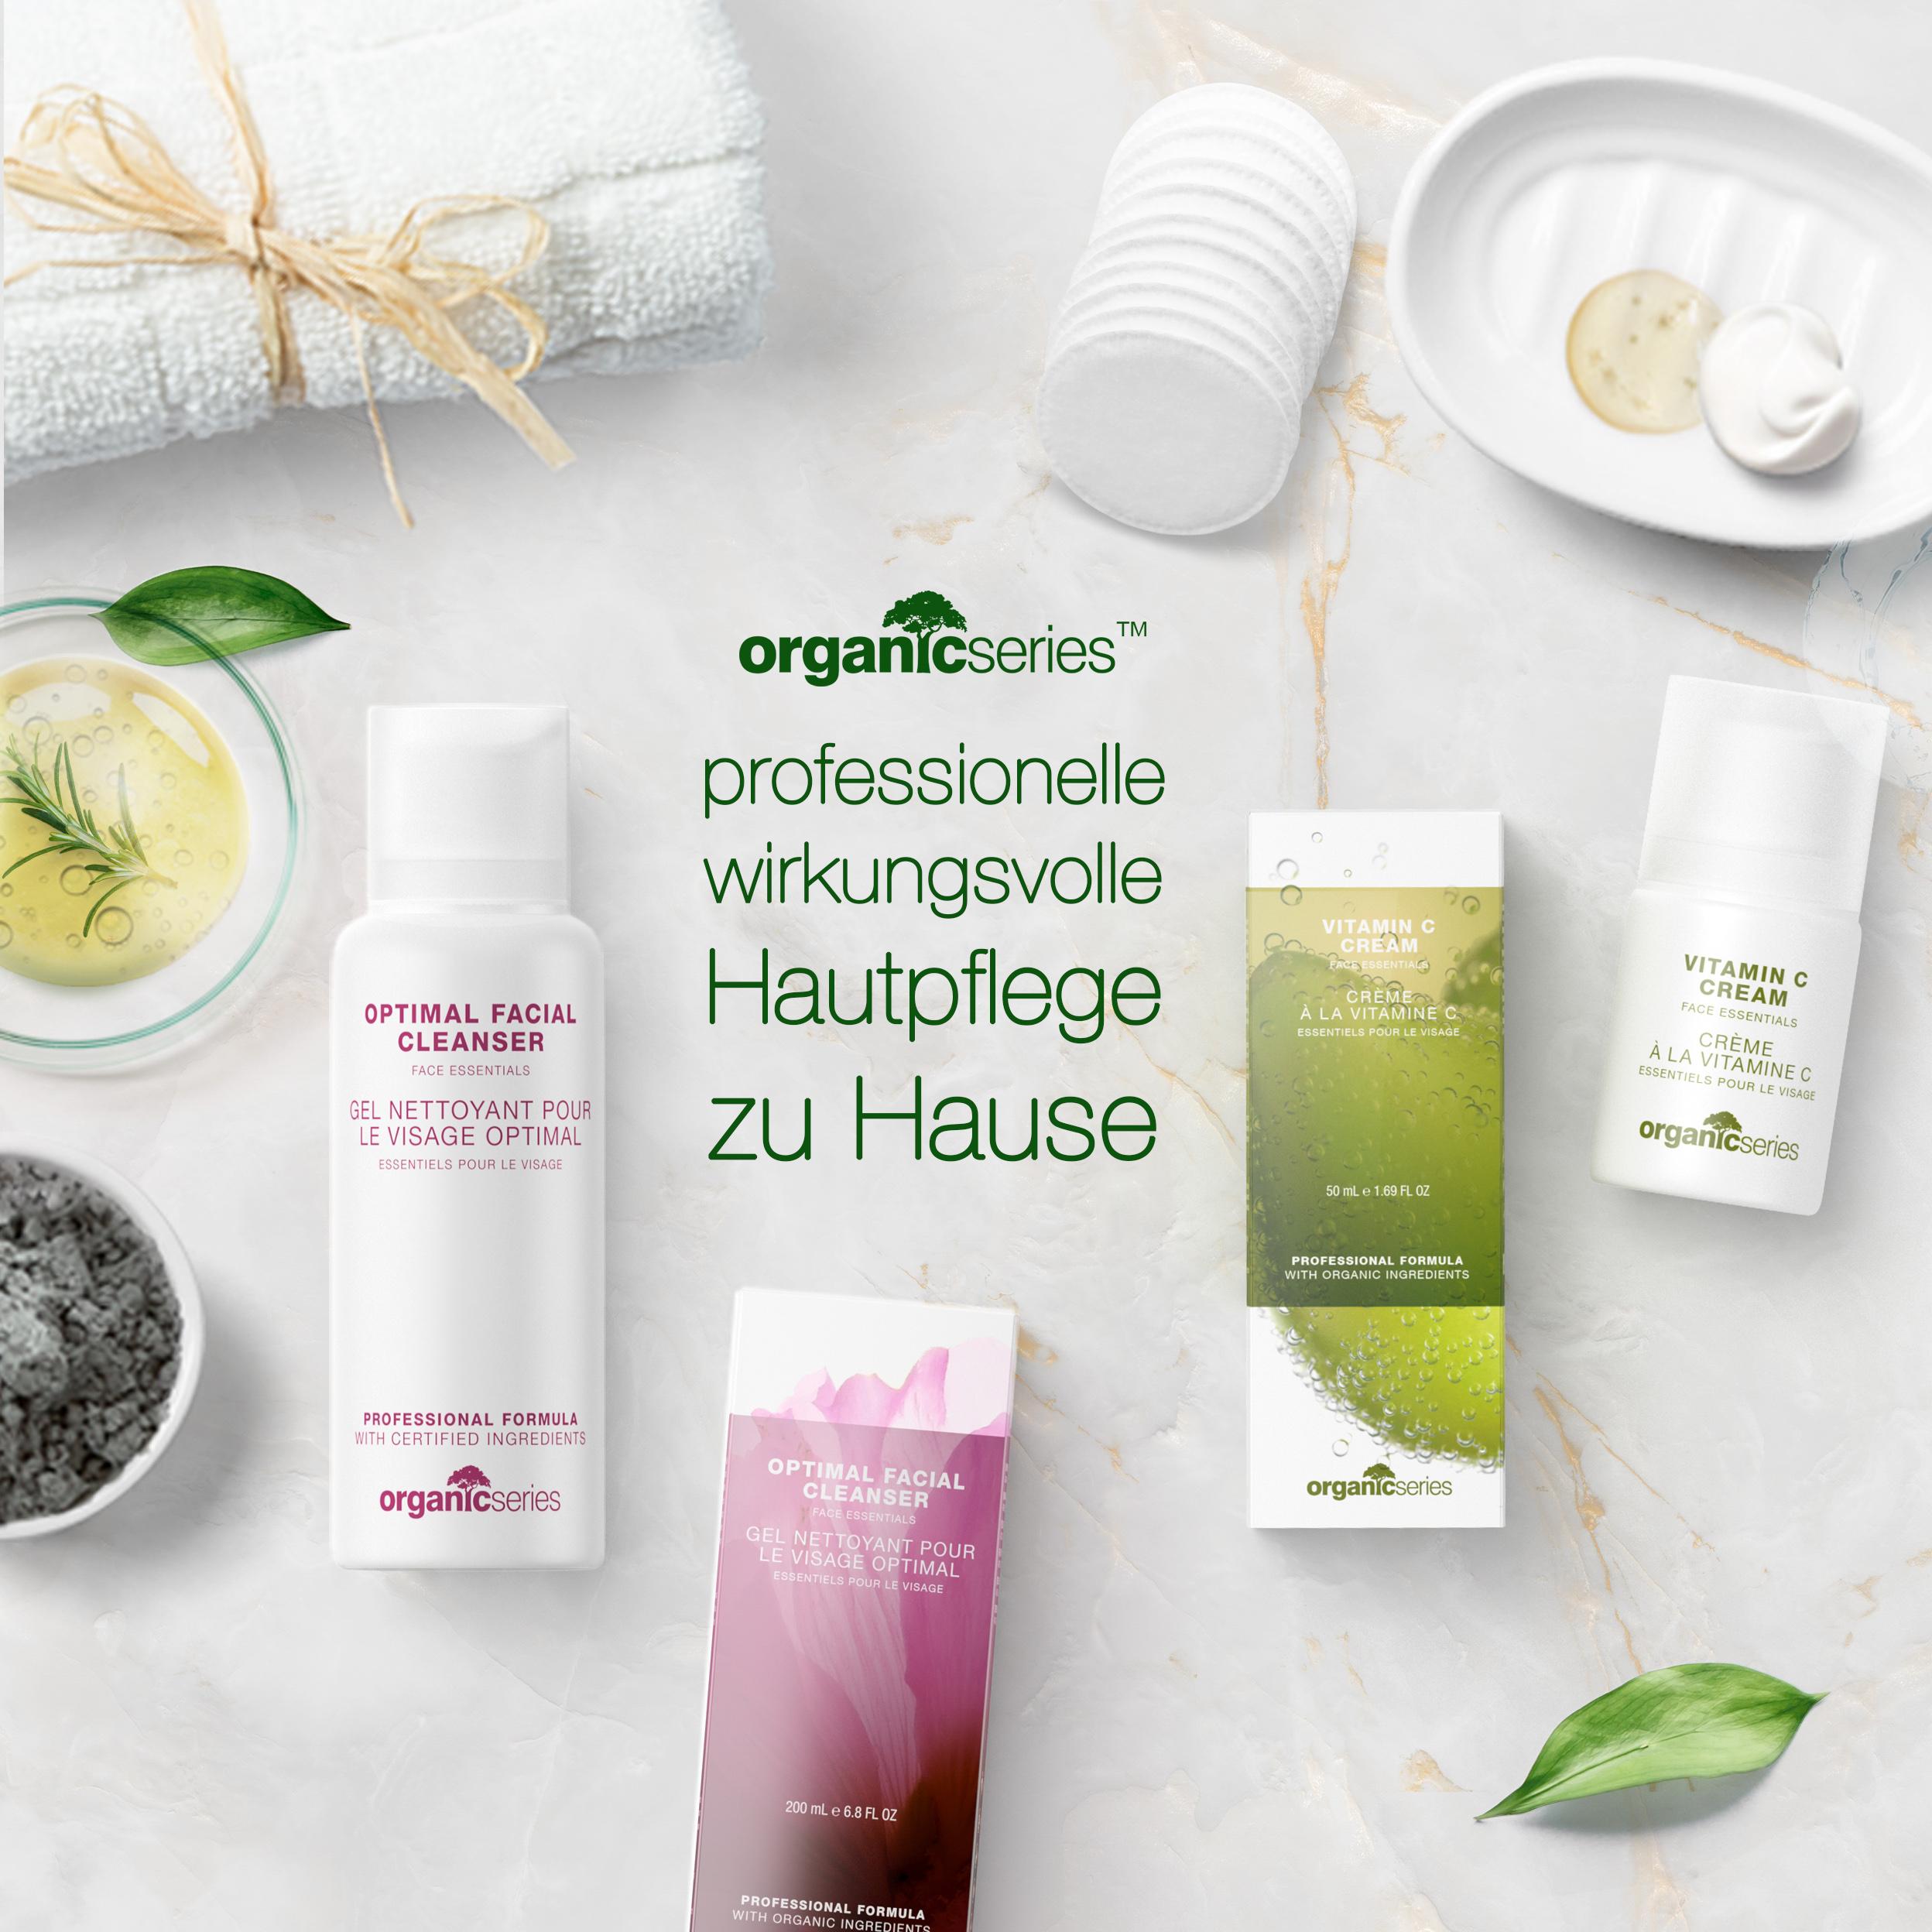 Hautpflege Zuhasue